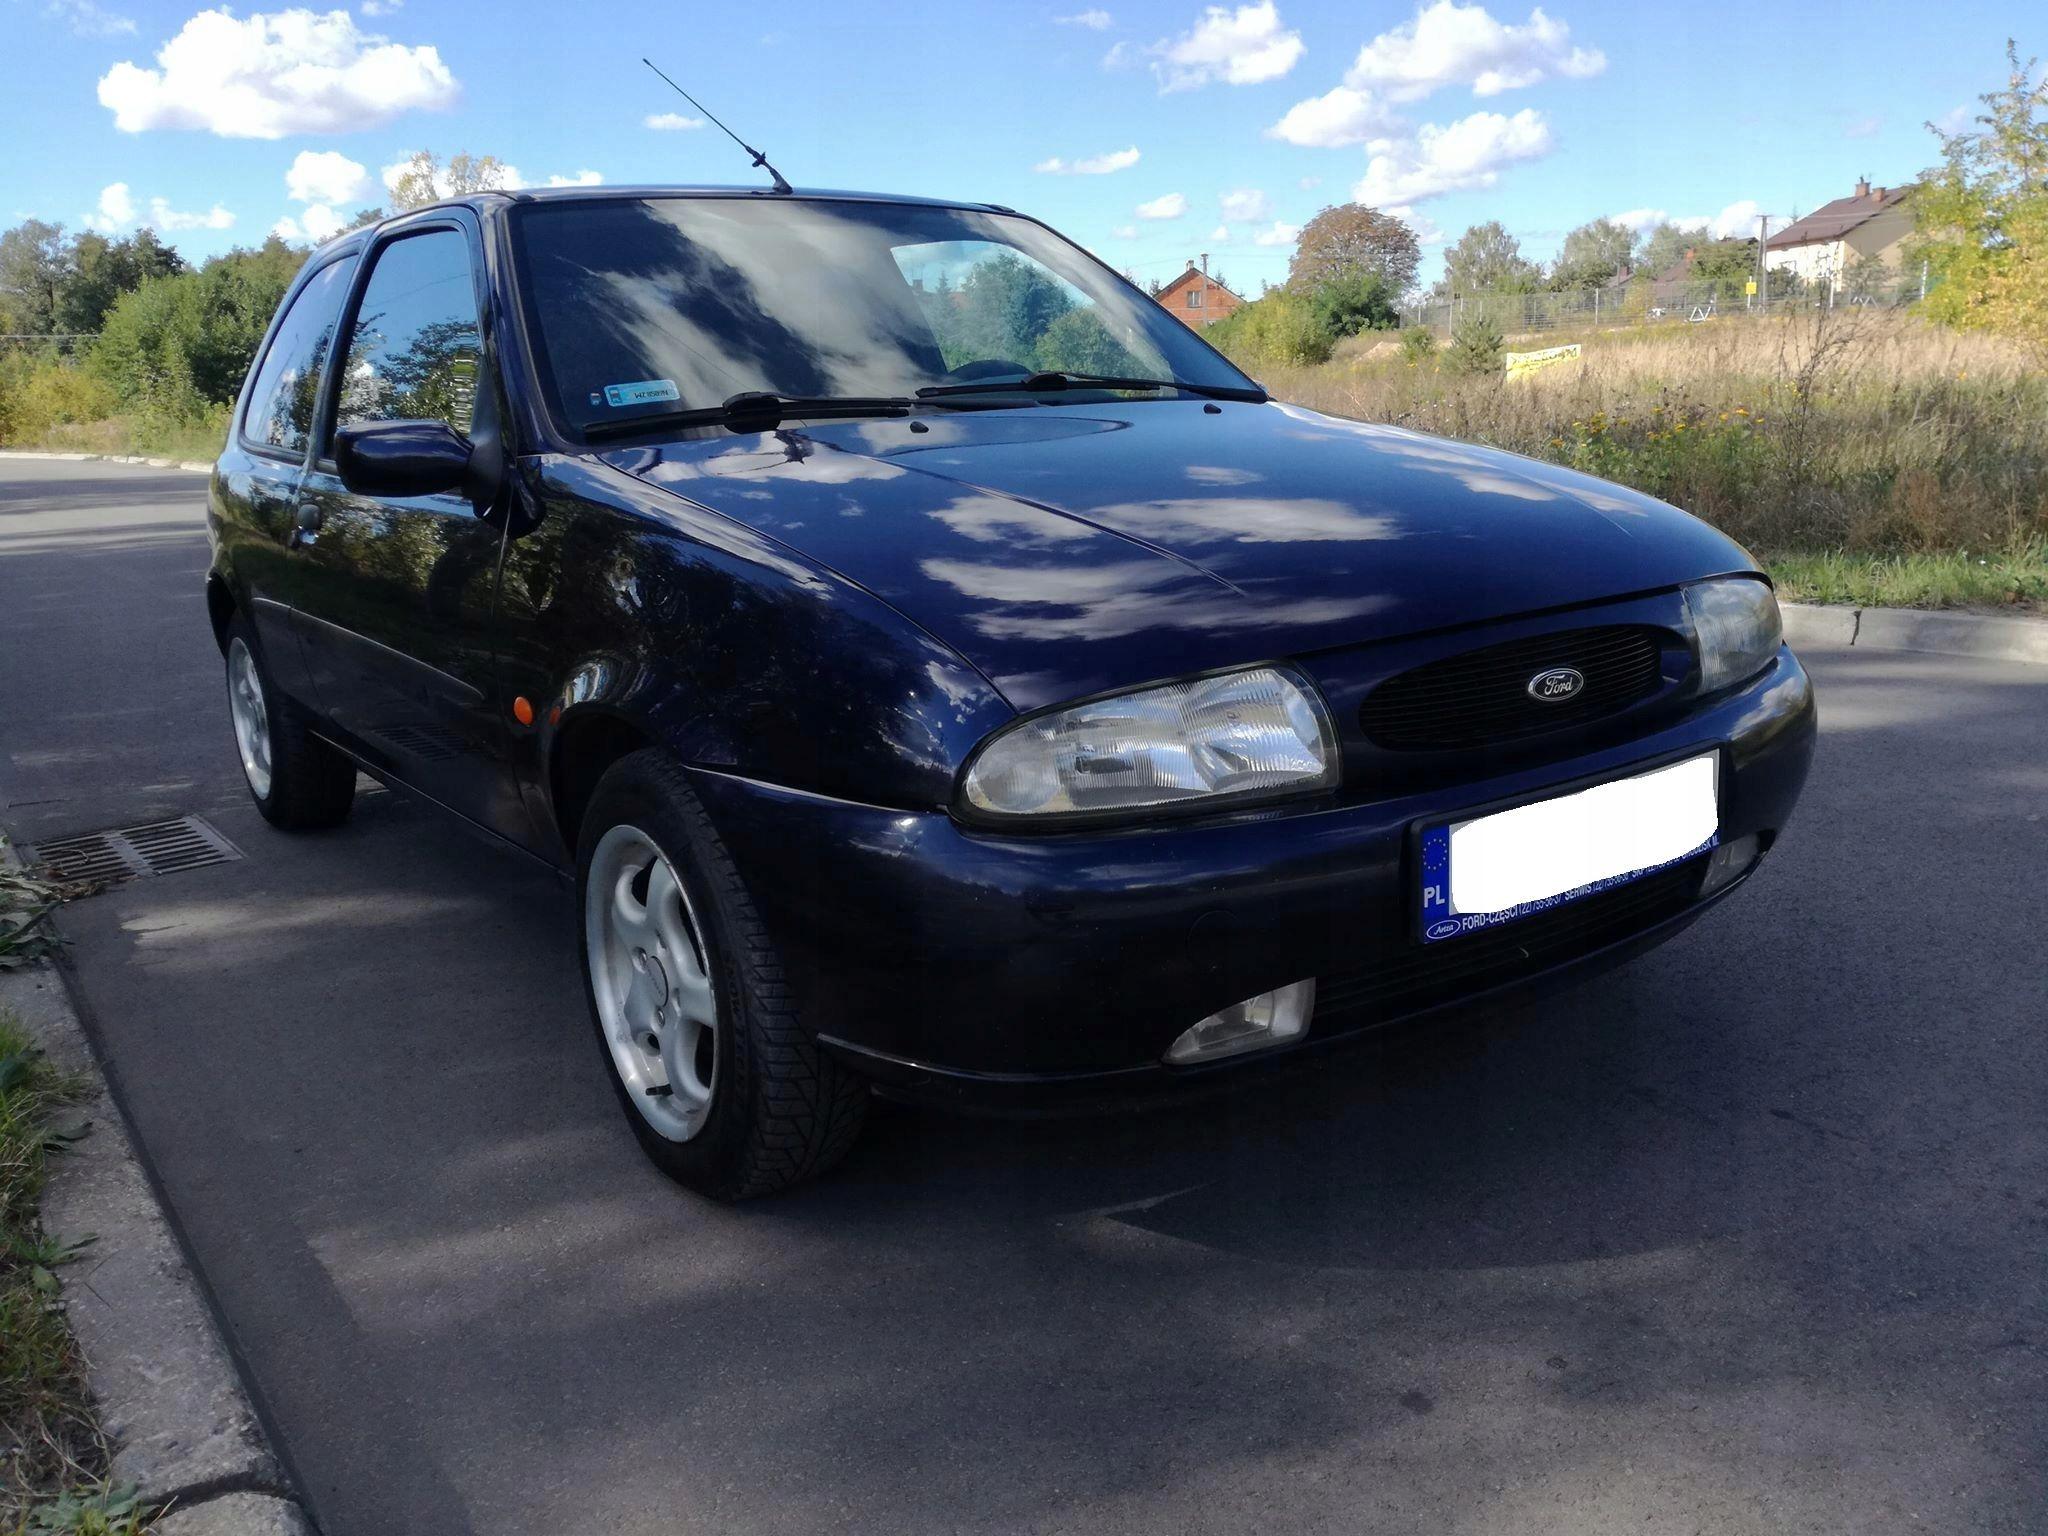 Ford Fiesta 1.25 75KM 1999r.